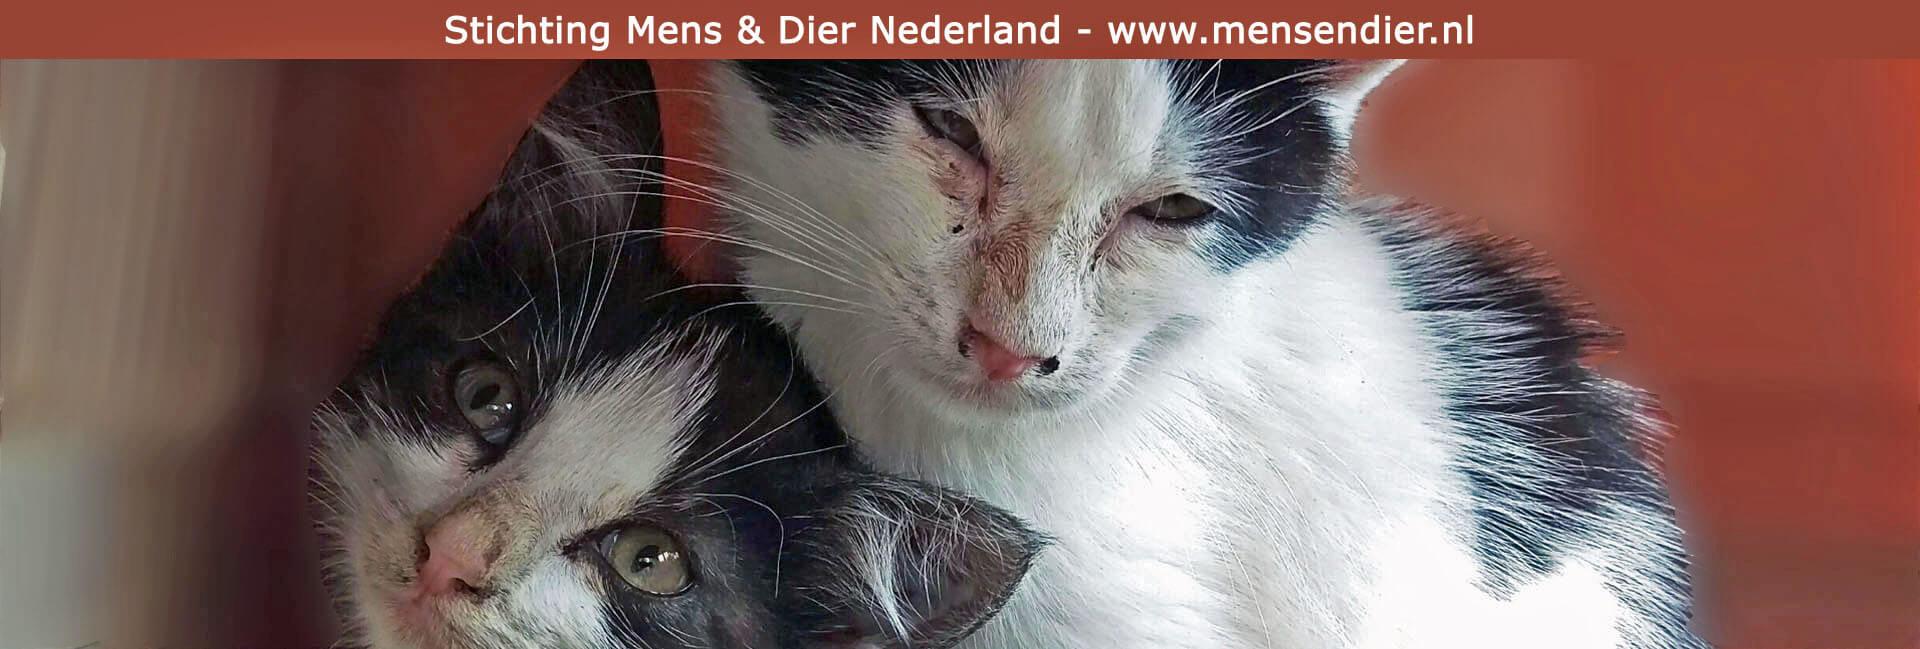 https://www.mensendier.nl/